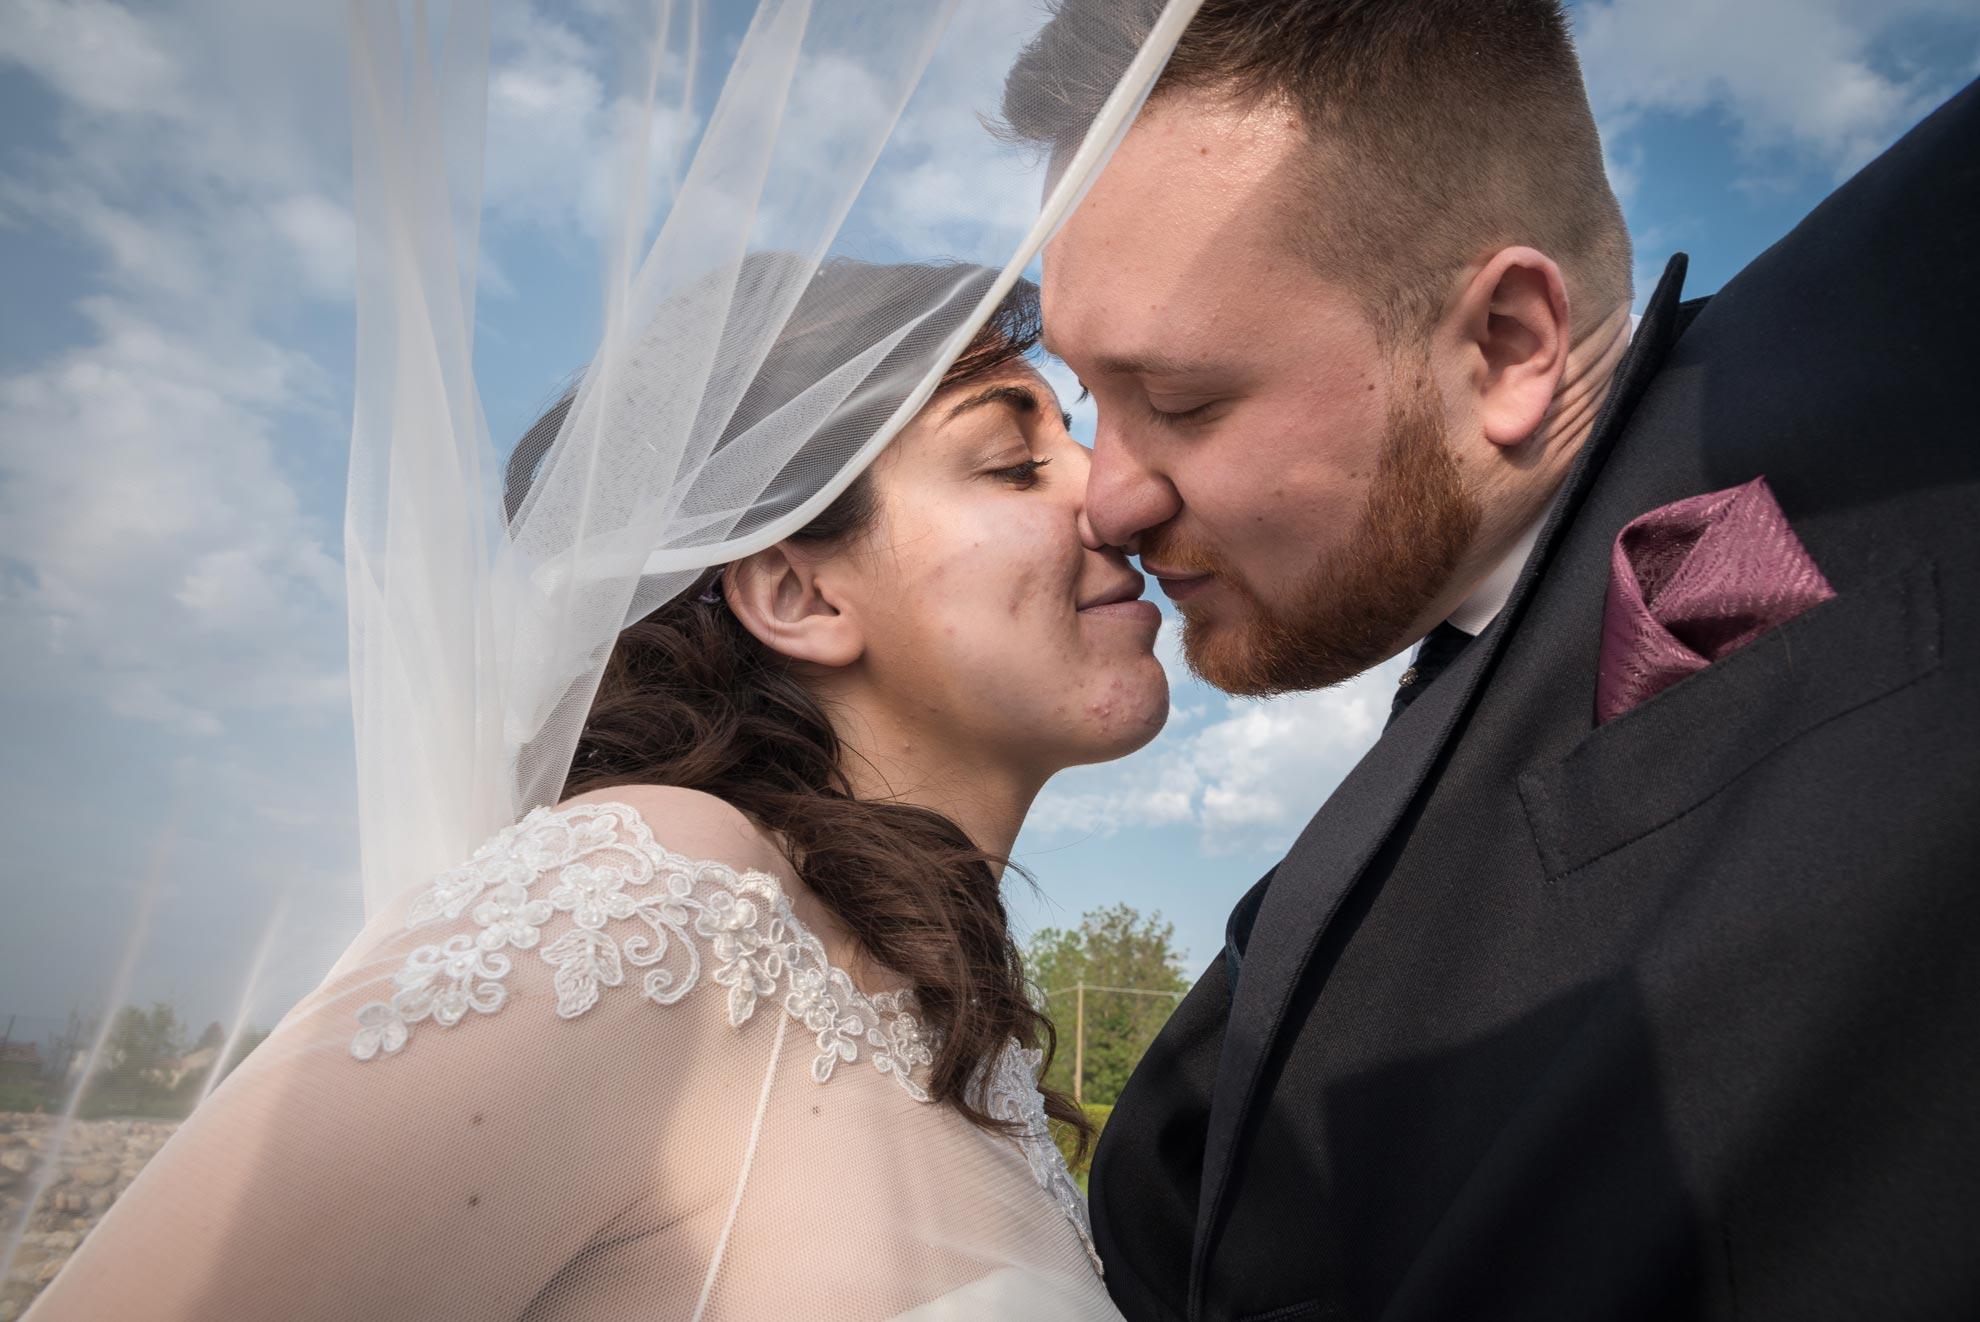 Matrimonio a Narzole Lorenza Diego - DSC 3219 - Fotografie matrimonio velo - Fotografie matrimonio velo